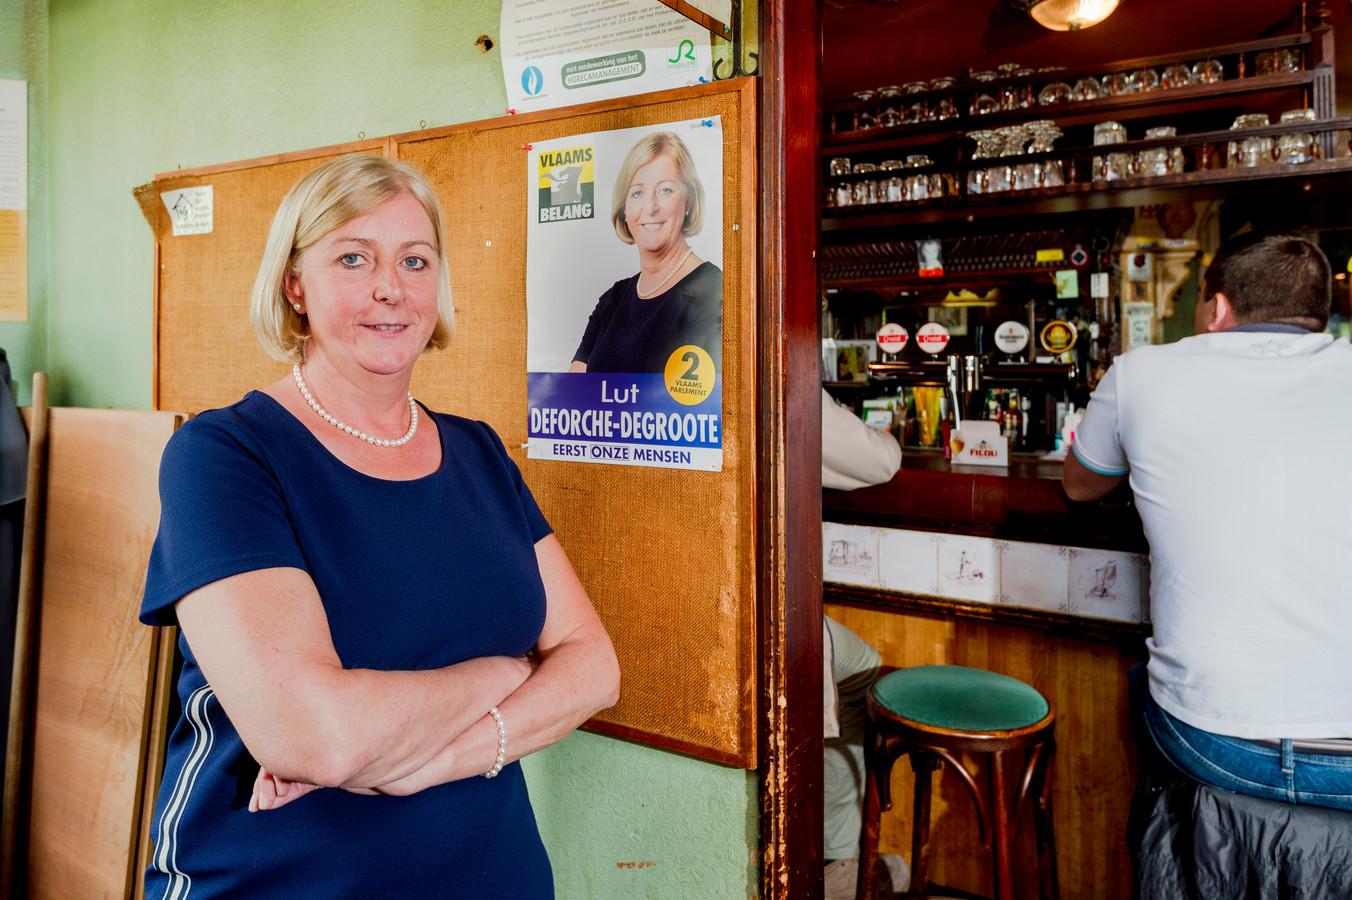 Lut Deforche-Degroote (53) blijft gewoon pintjes tappen in haar Vlaamse café Gezelle in Roeselare.